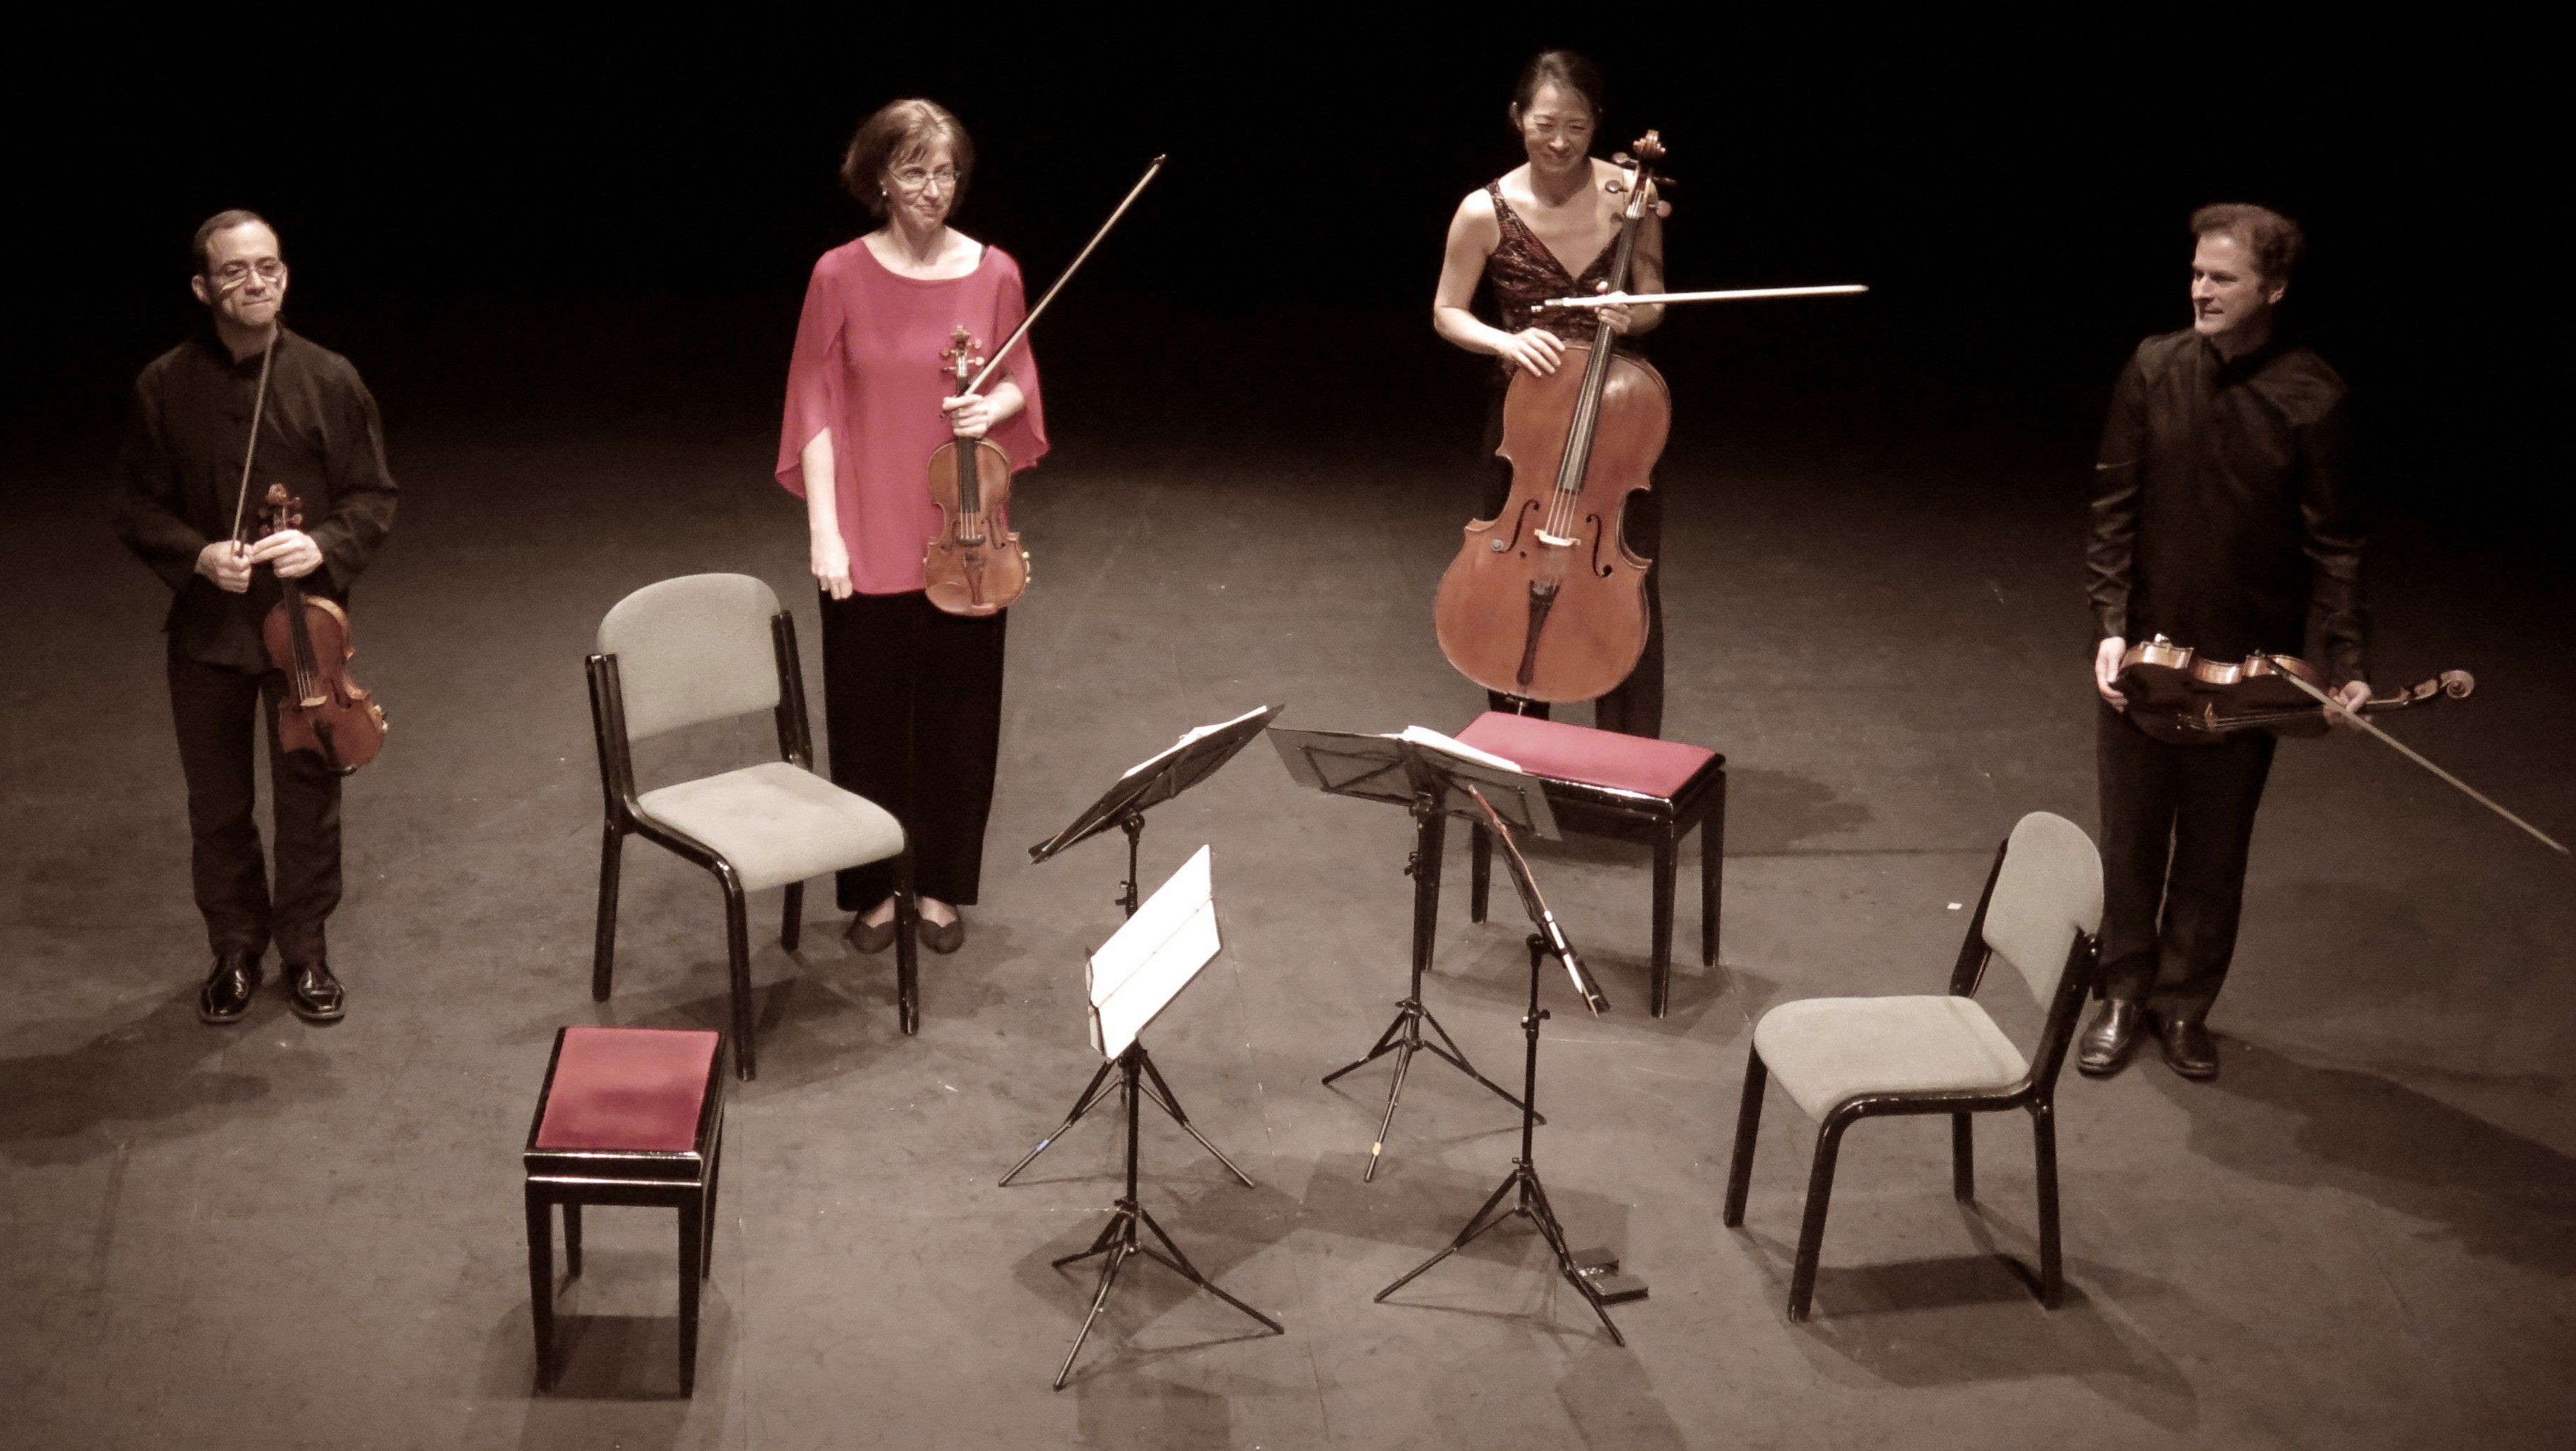 Cuarteto Brentano (Fotografía: María Marí-Pérez)